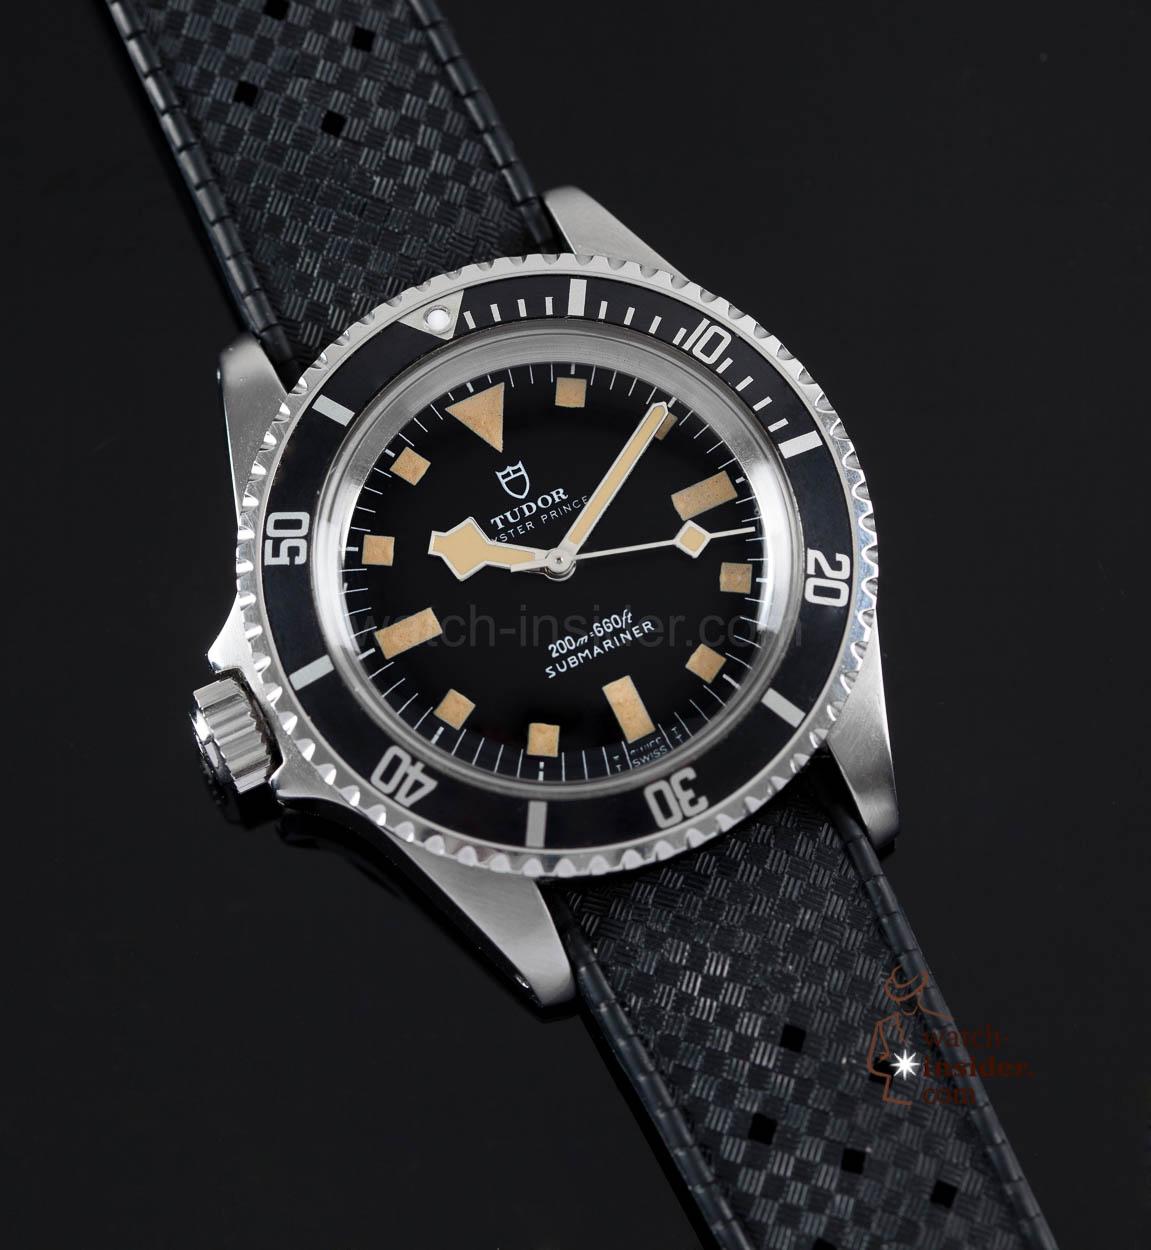 Tudor pelagos lhd left hand drive the right choice - Tudor dive watch ...